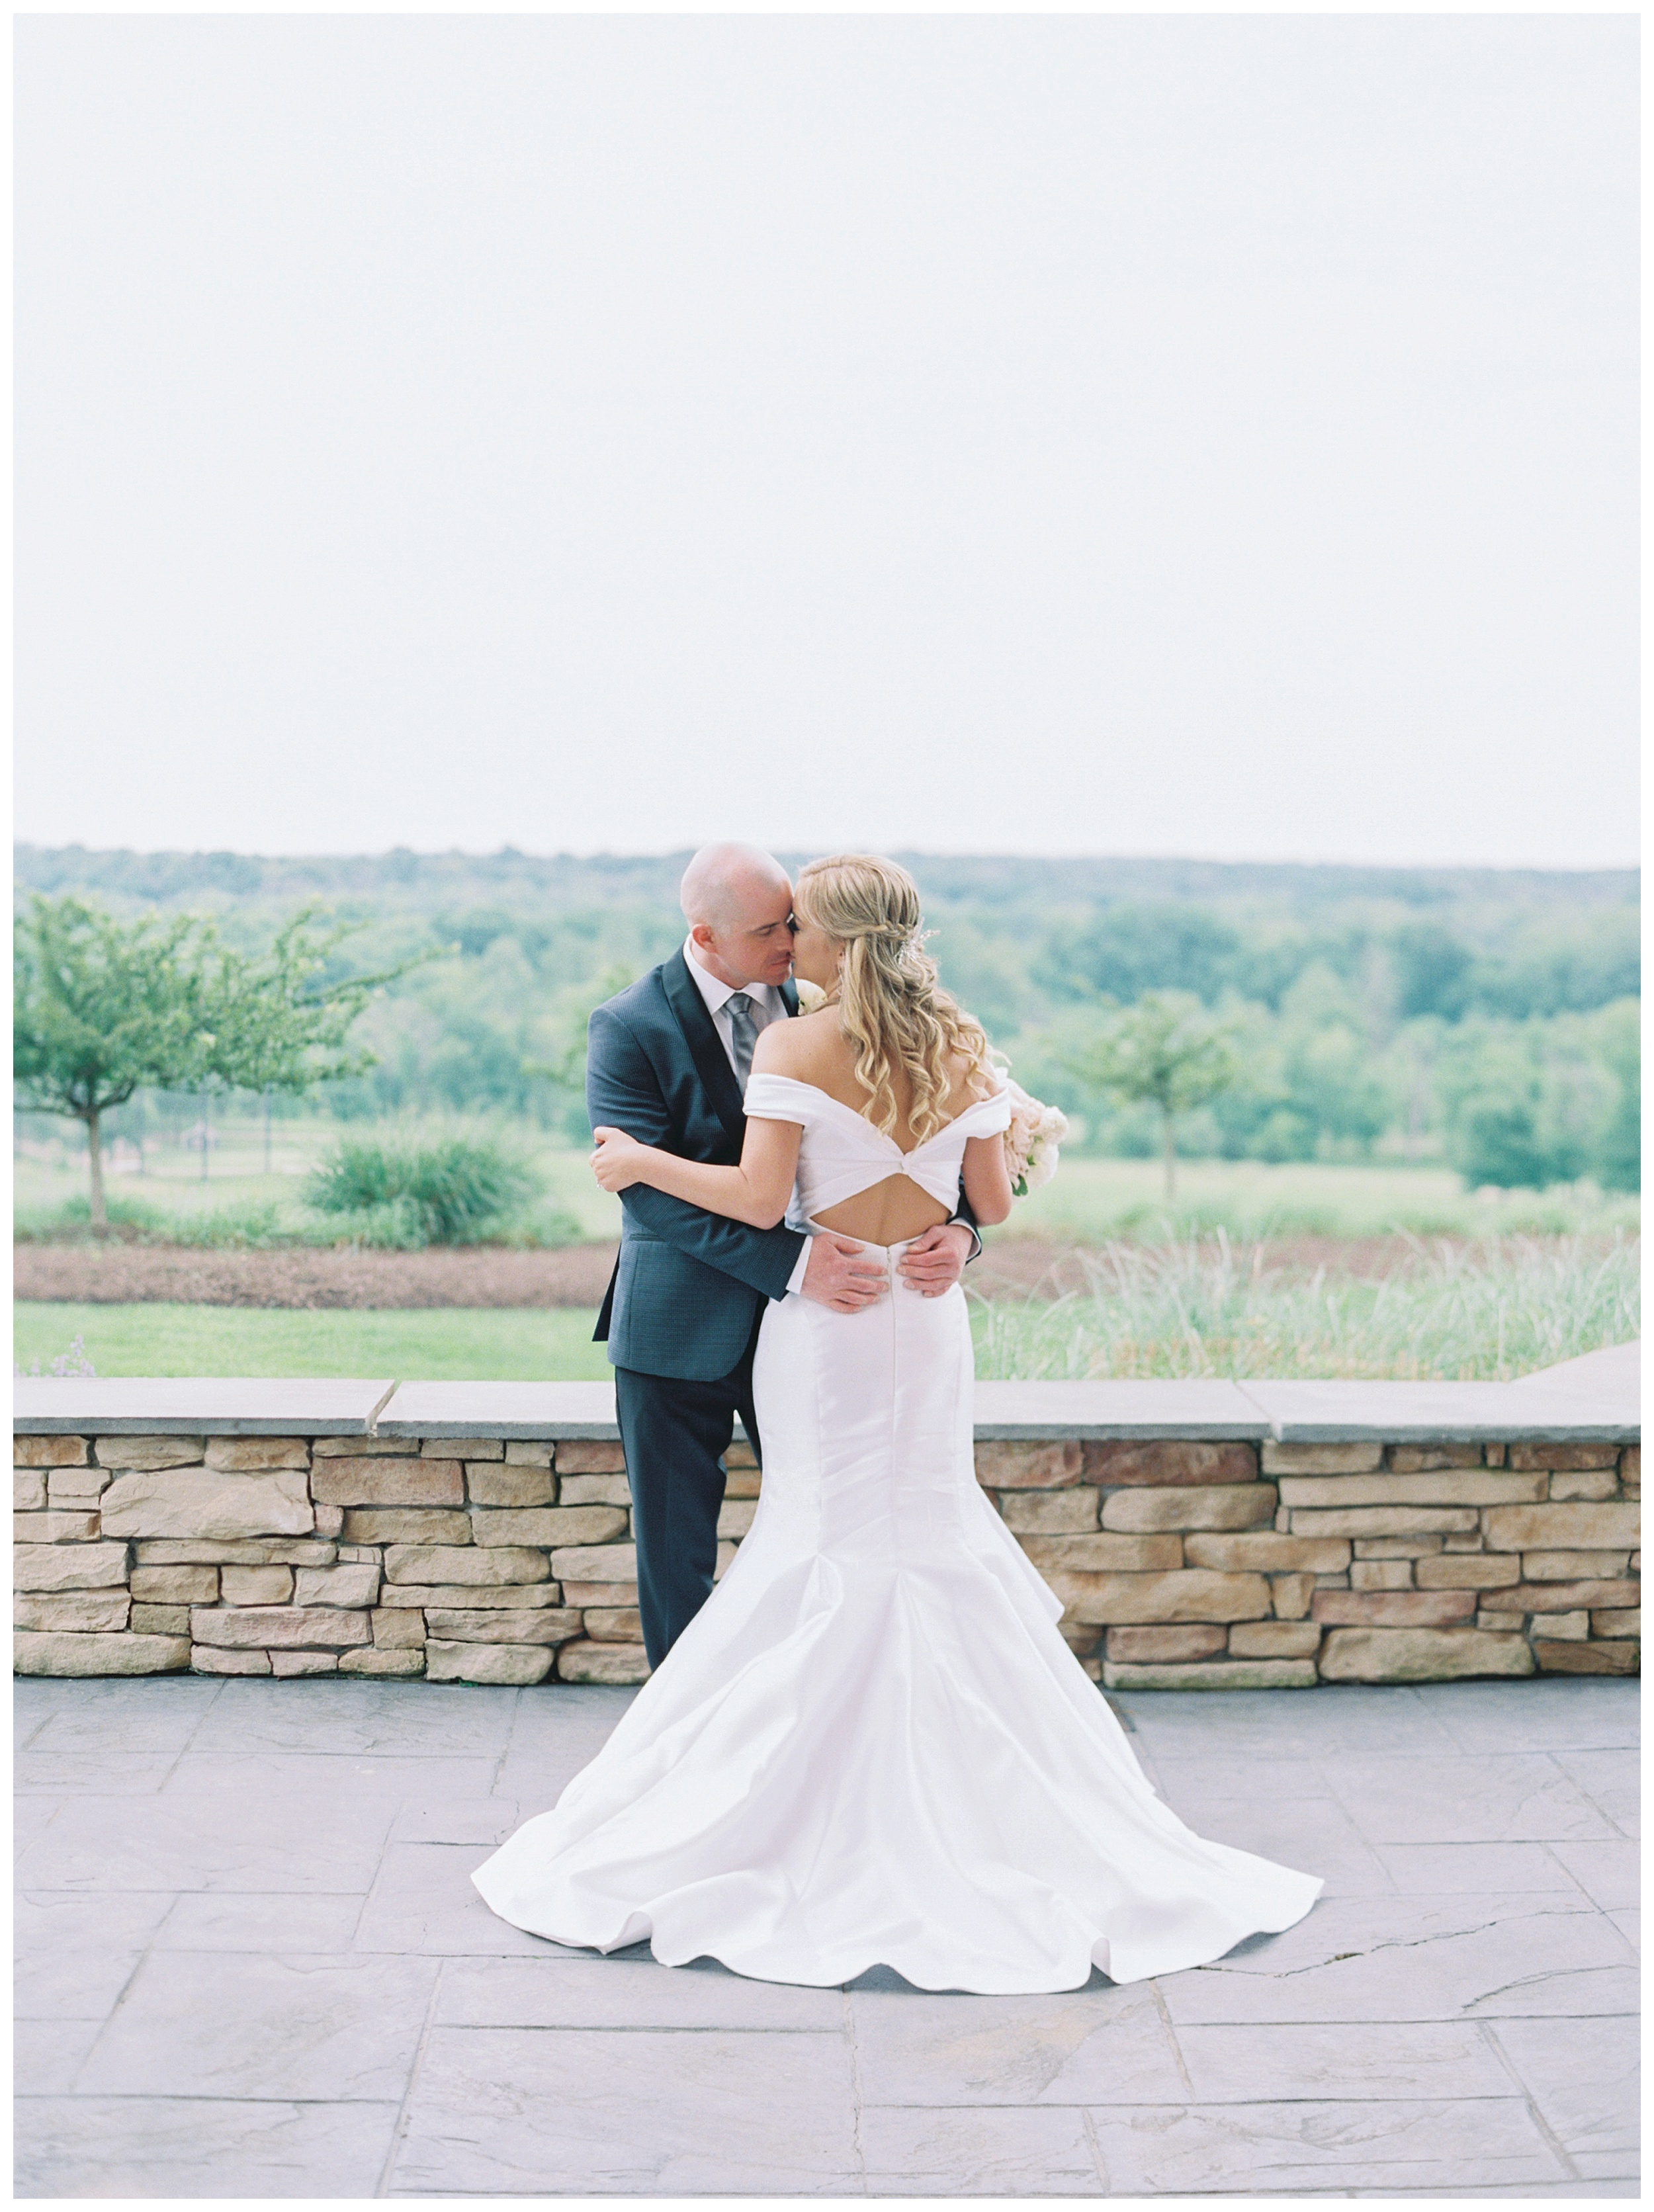 Lansdowne Resort Wedding | Virginia Film Wedding Photographer Kir Tuben_0049.jpg